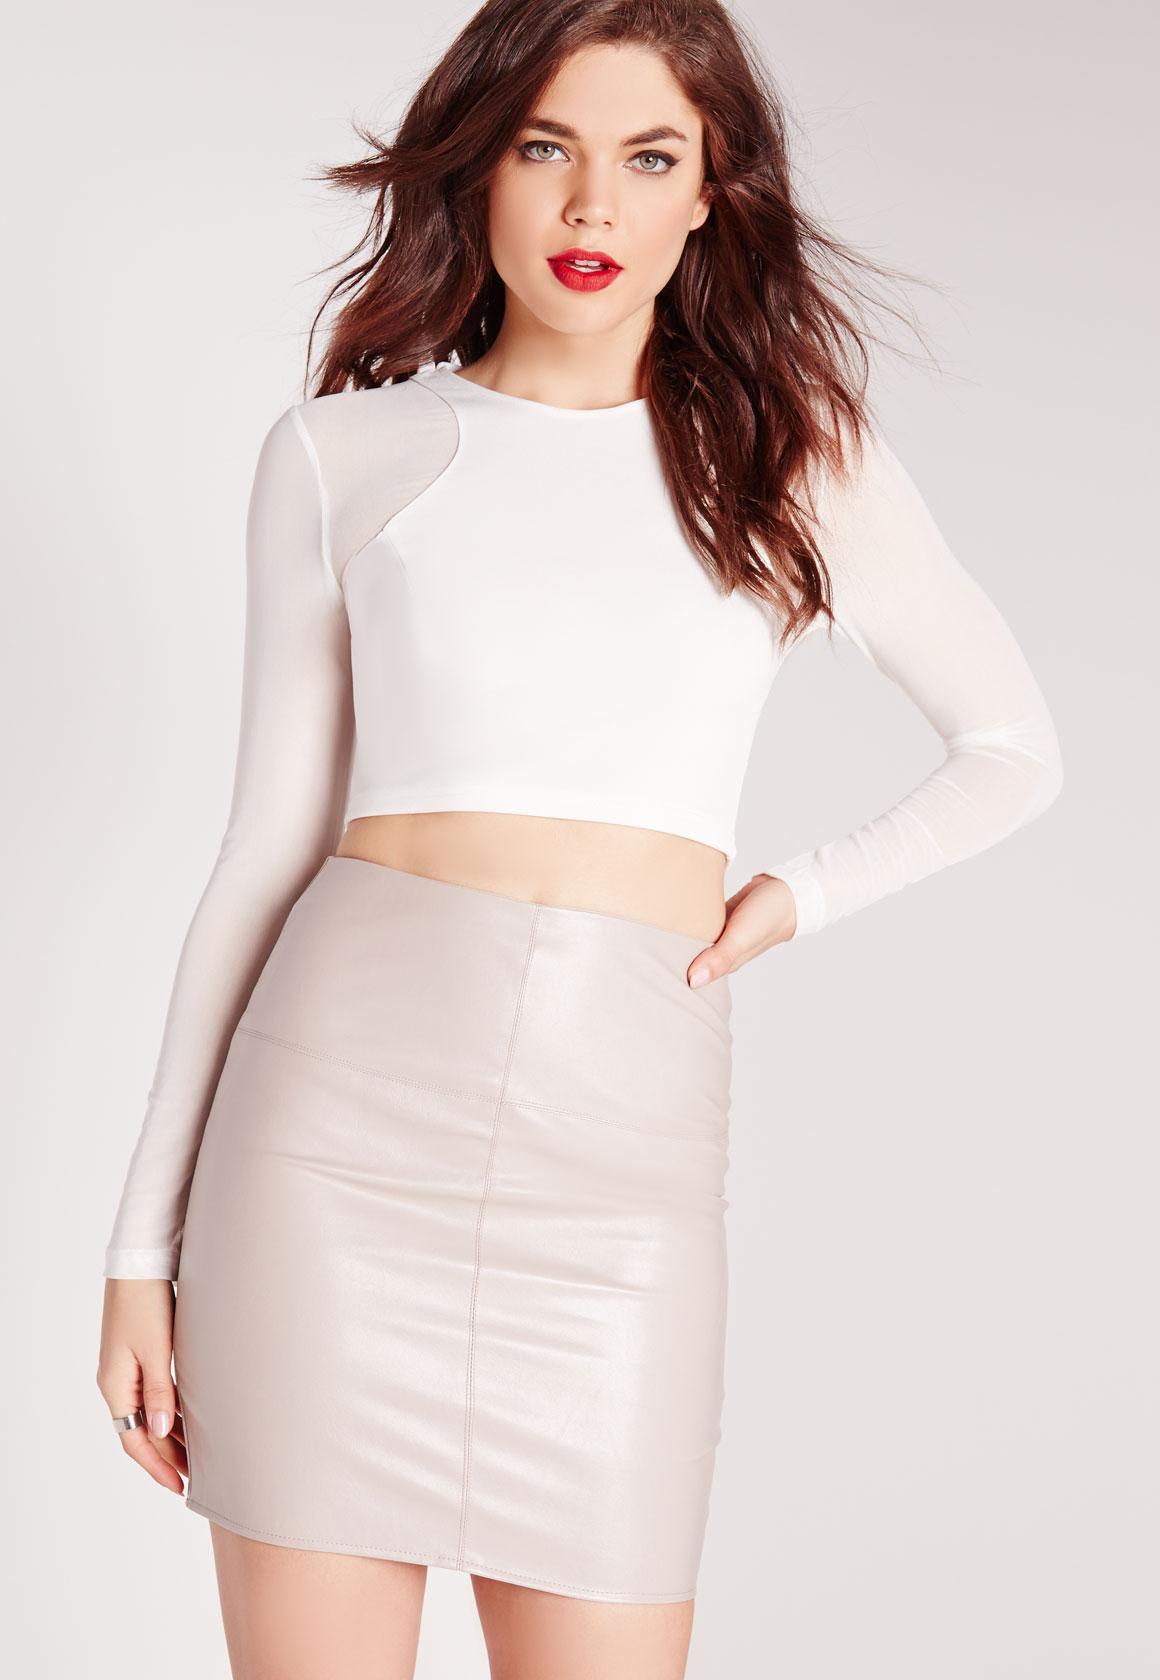 All white long sleeve crop top dress